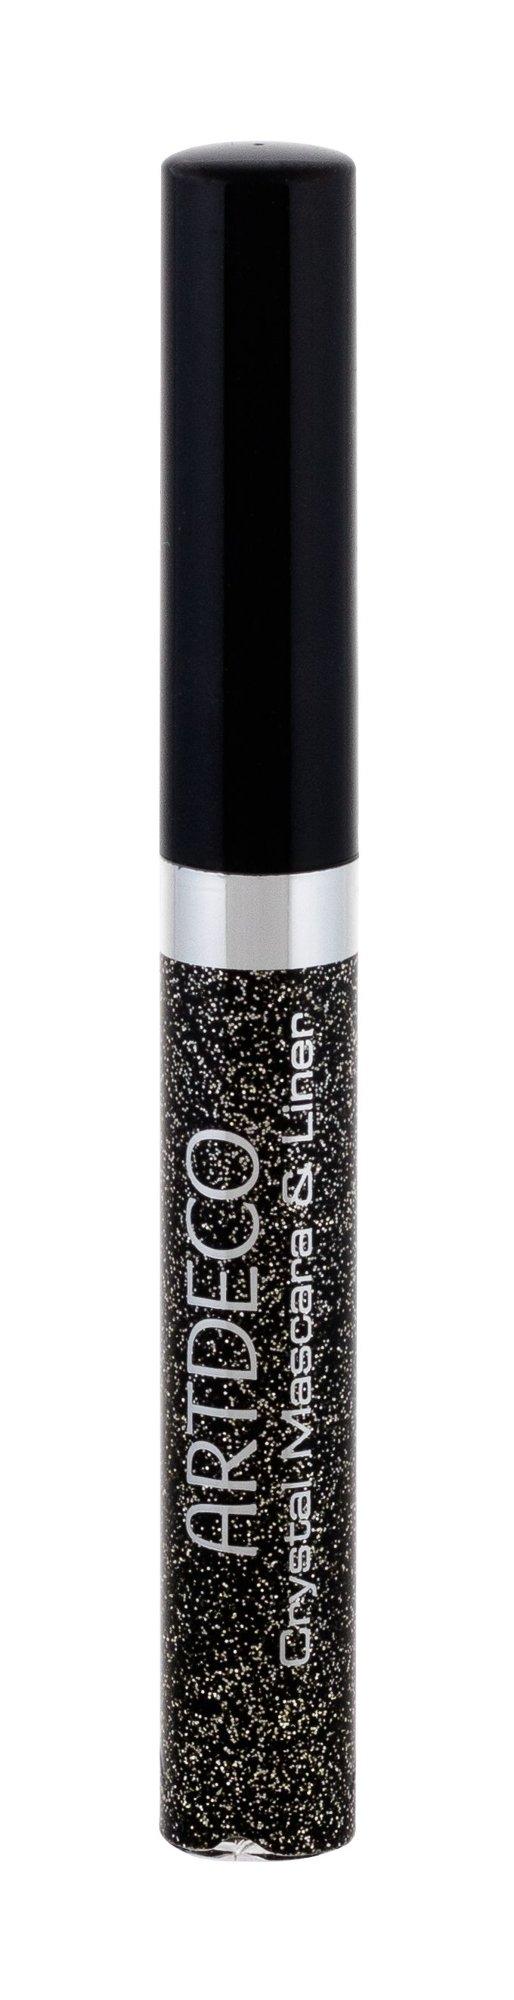 Artdeco Crystal Mascara & Liner Eye Line 5ml 5 Gold Glitter